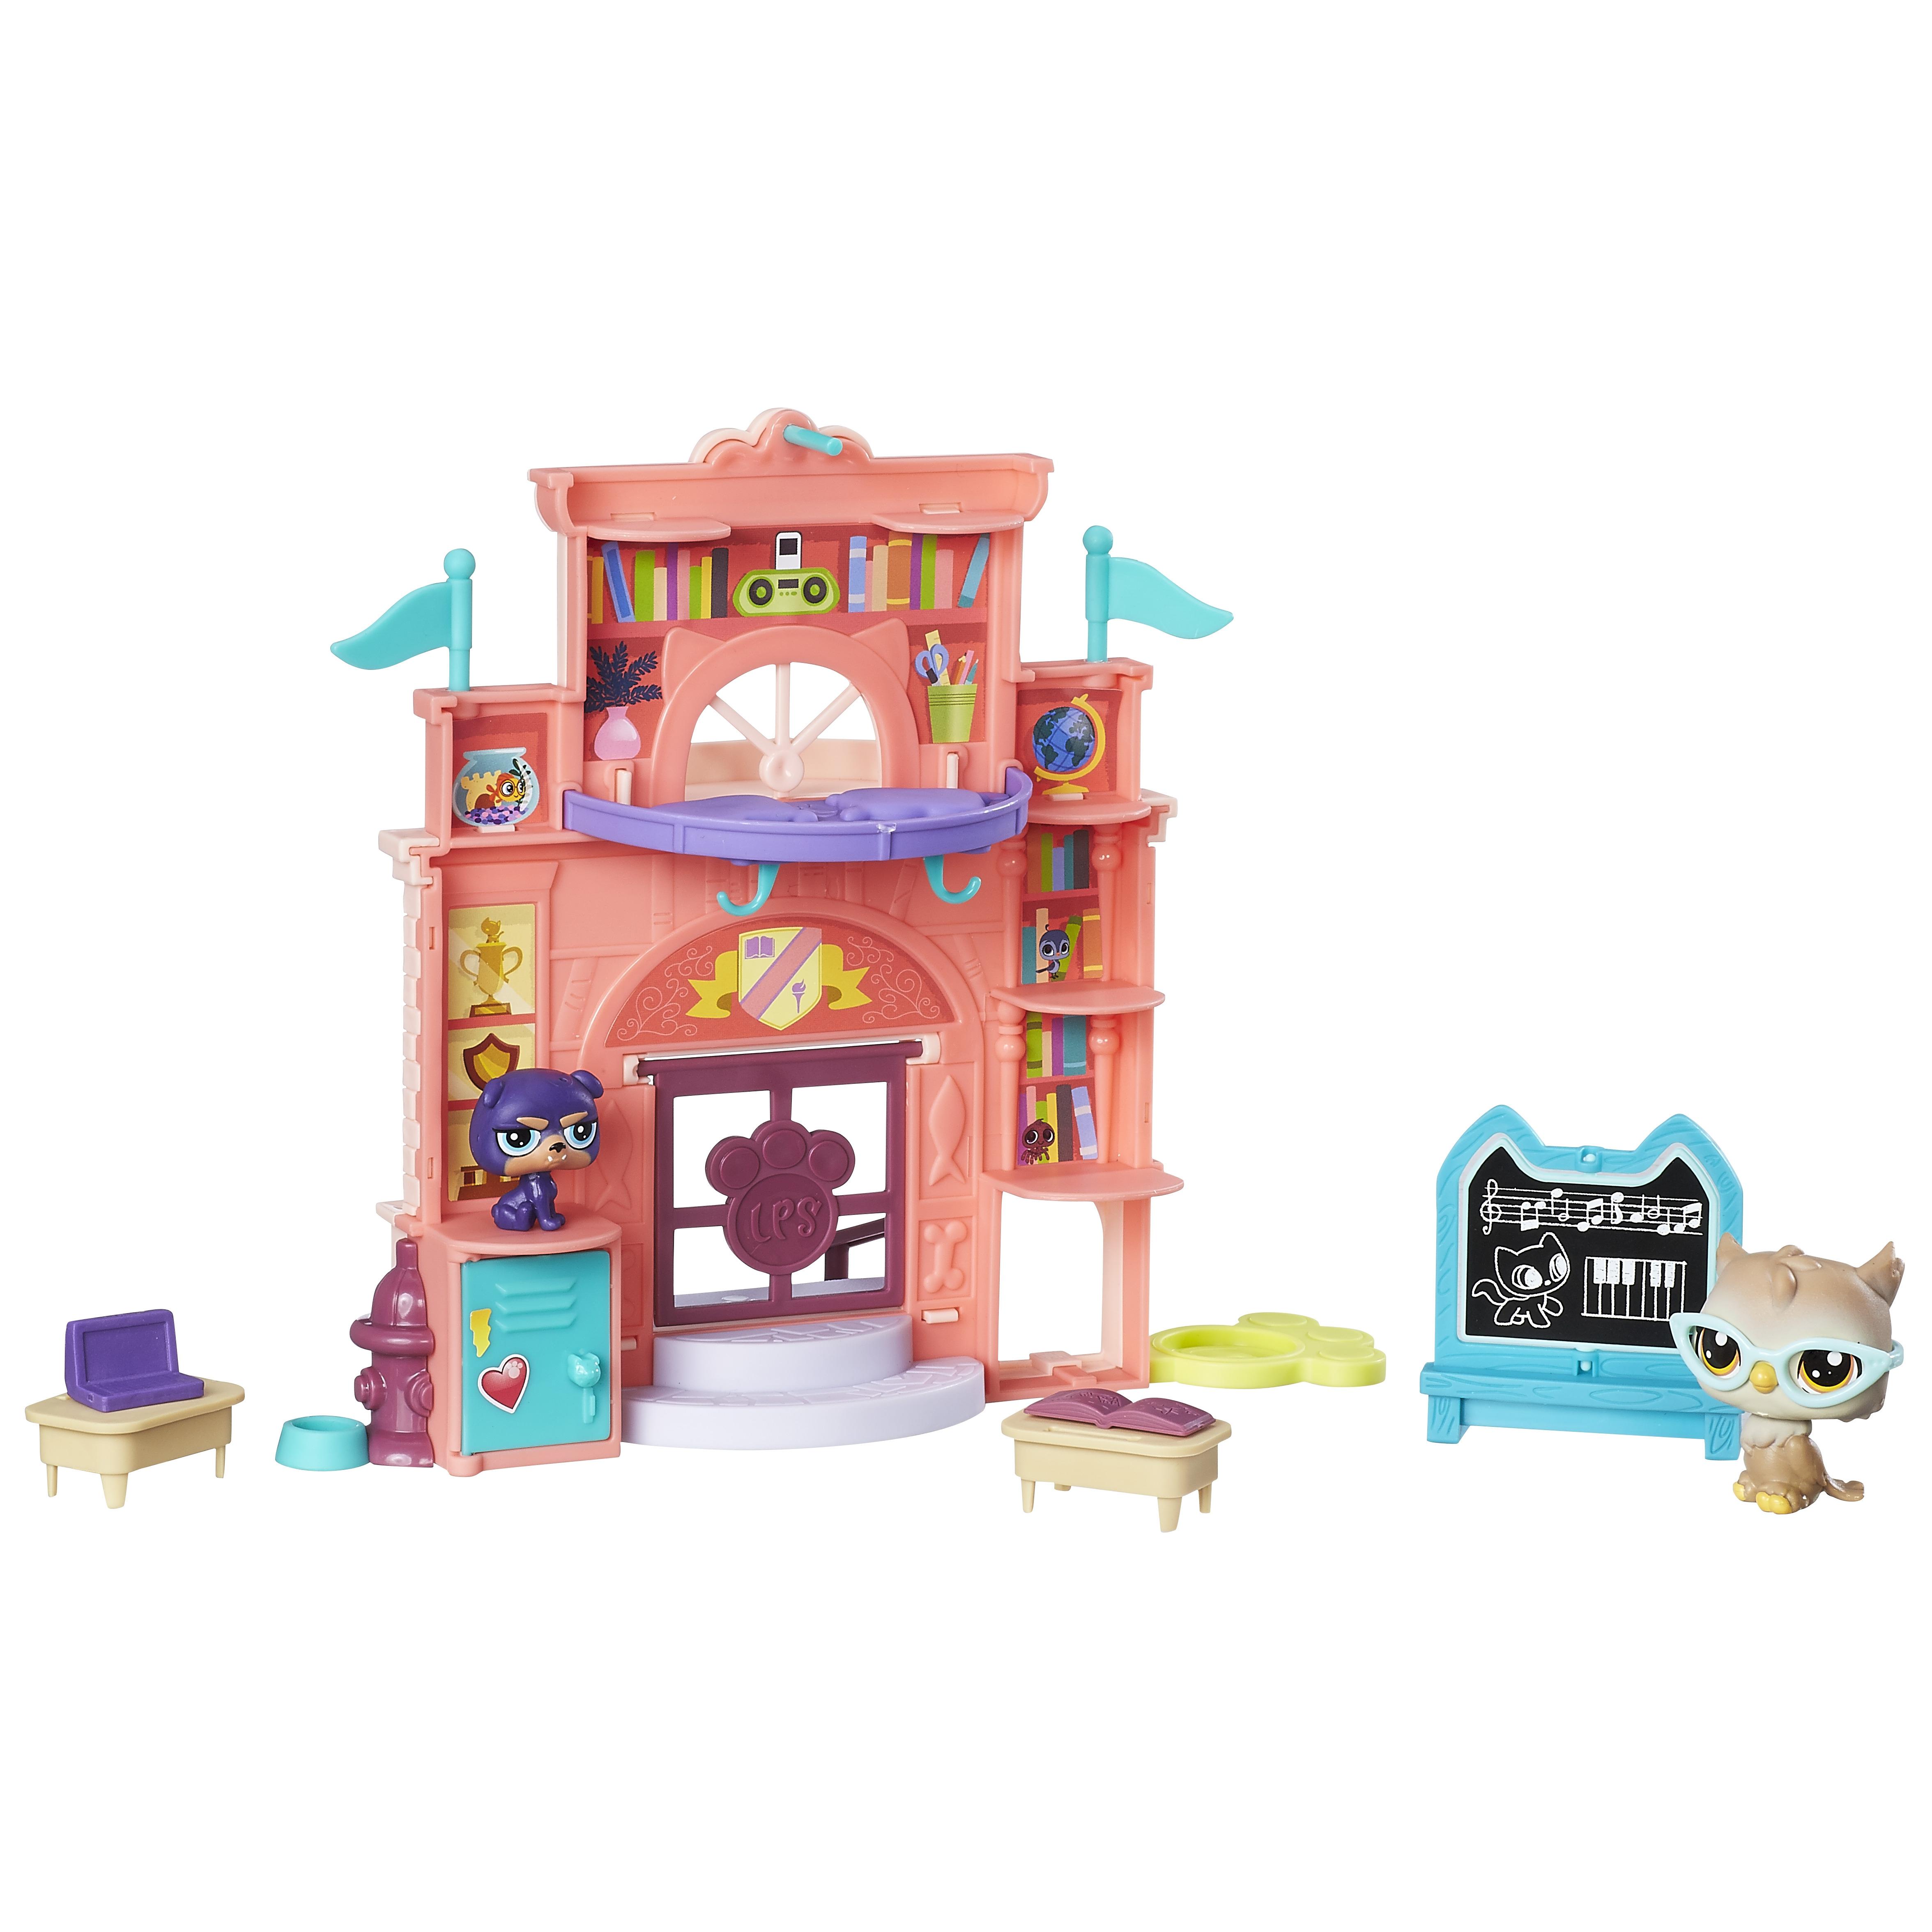 Littlest Pet Shop LITTLEST PET SHOP Школа»/«Аквапарк тюбинг belon тент спираль аквапарк 85см